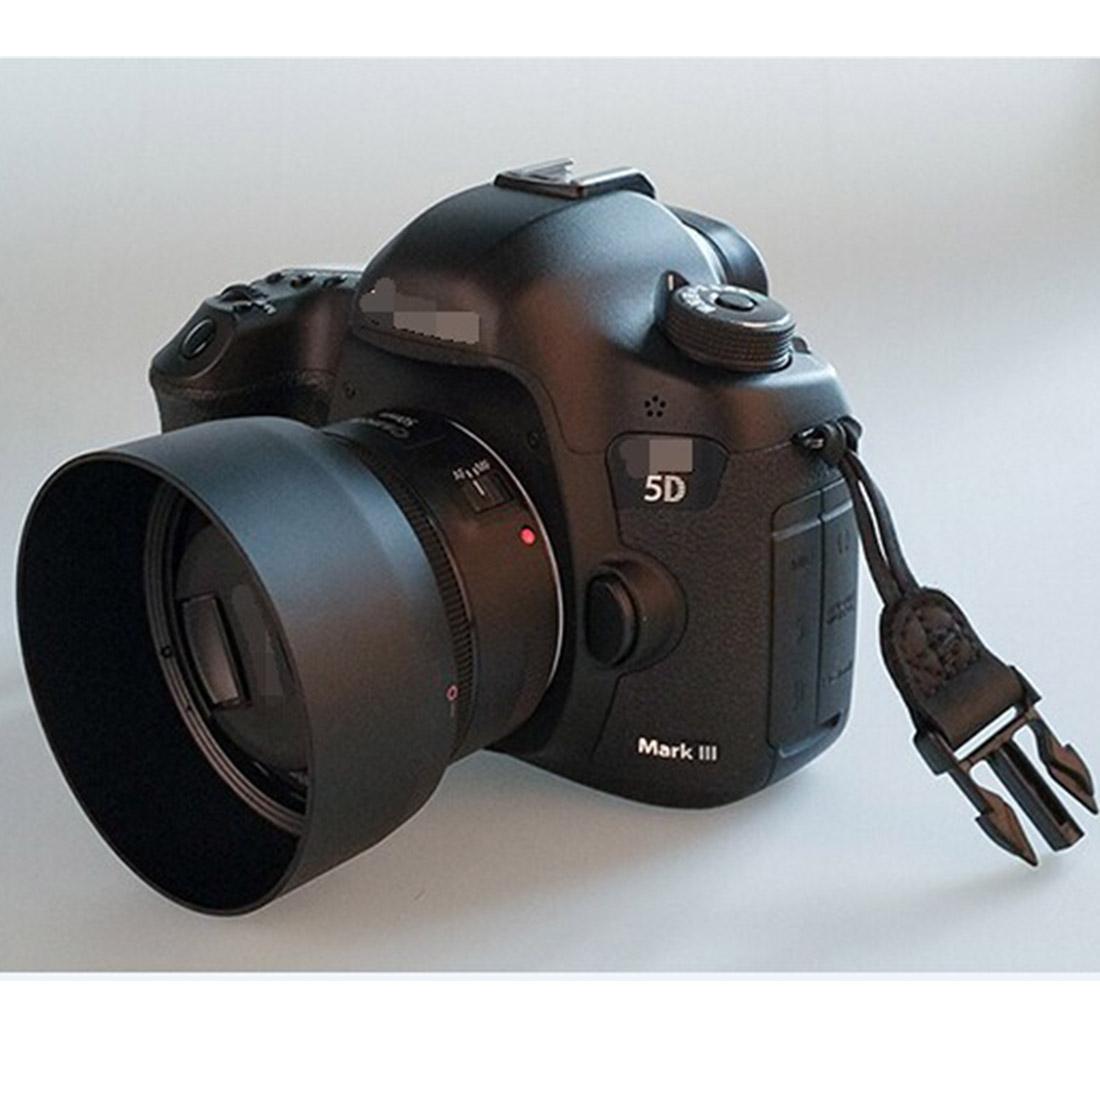 Camera Lens Hood Online Store Singapore Lazada For Cameras 52mm Screw Mount New Canon Es68 Es 68 Ef 50mm F 18